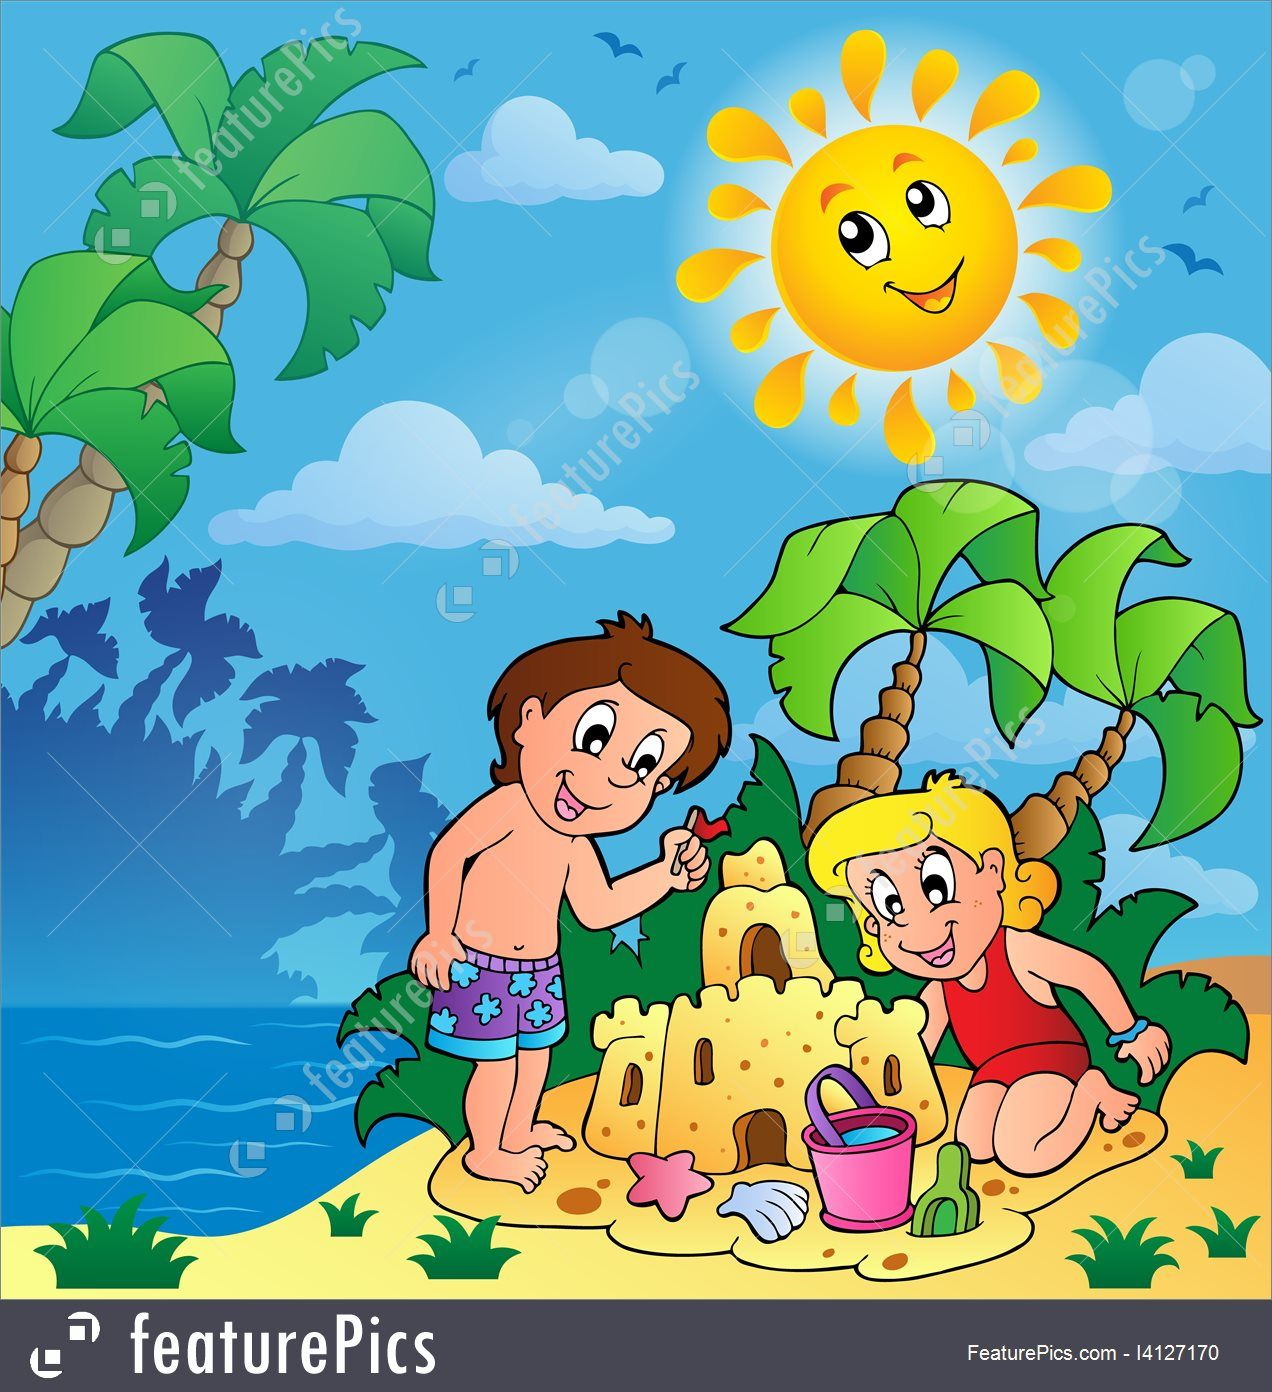 Clipart Summer Summer Season Clipart Summer Summer Season